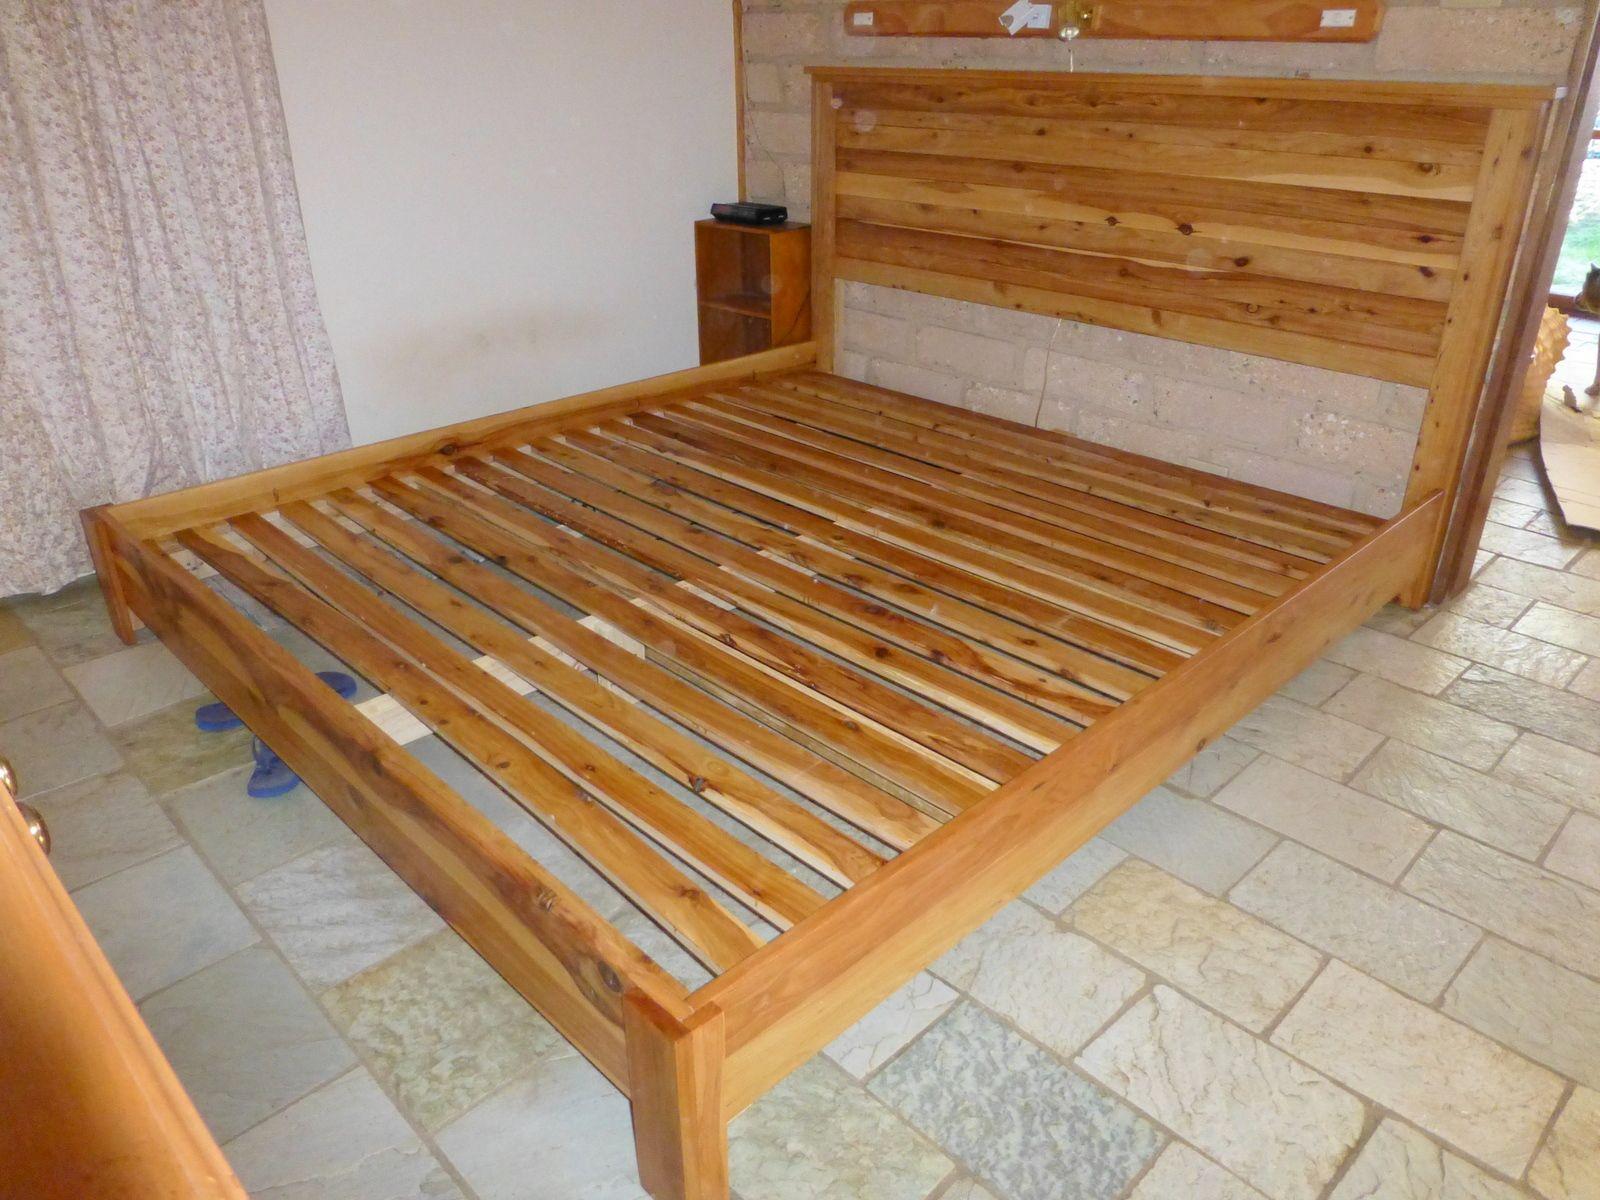 Diy King Size Bed Plans